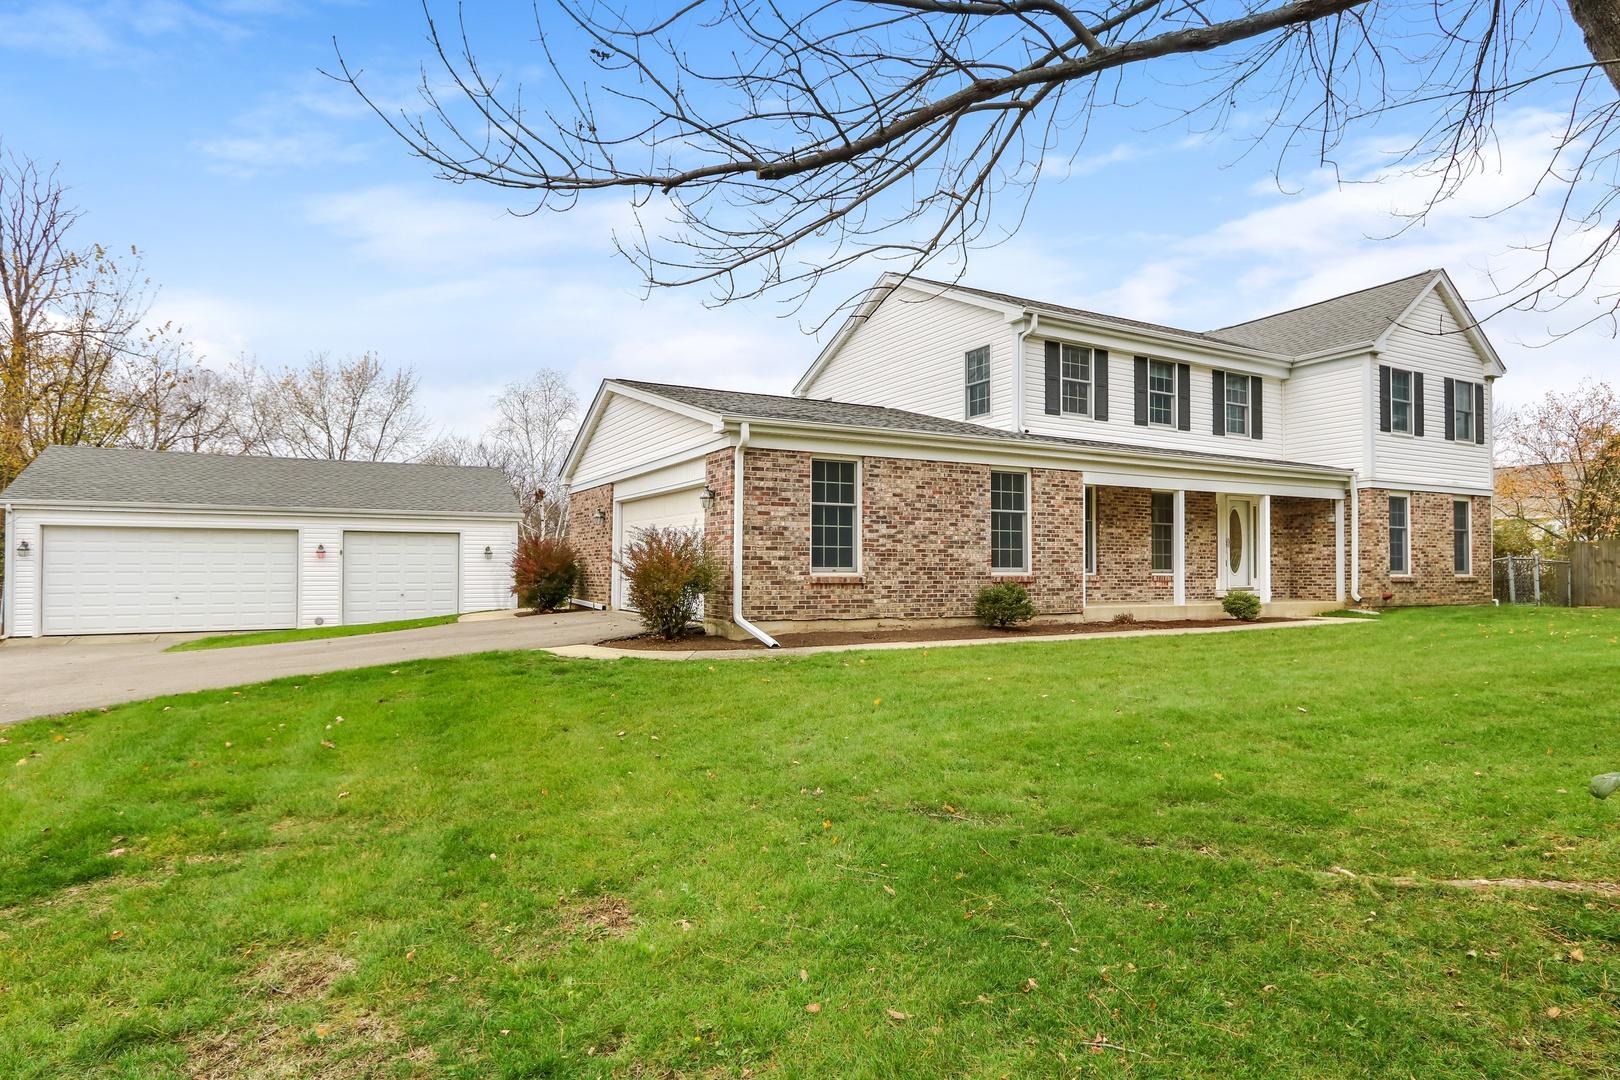 523 Ela ,Barrington, Illinois 60010